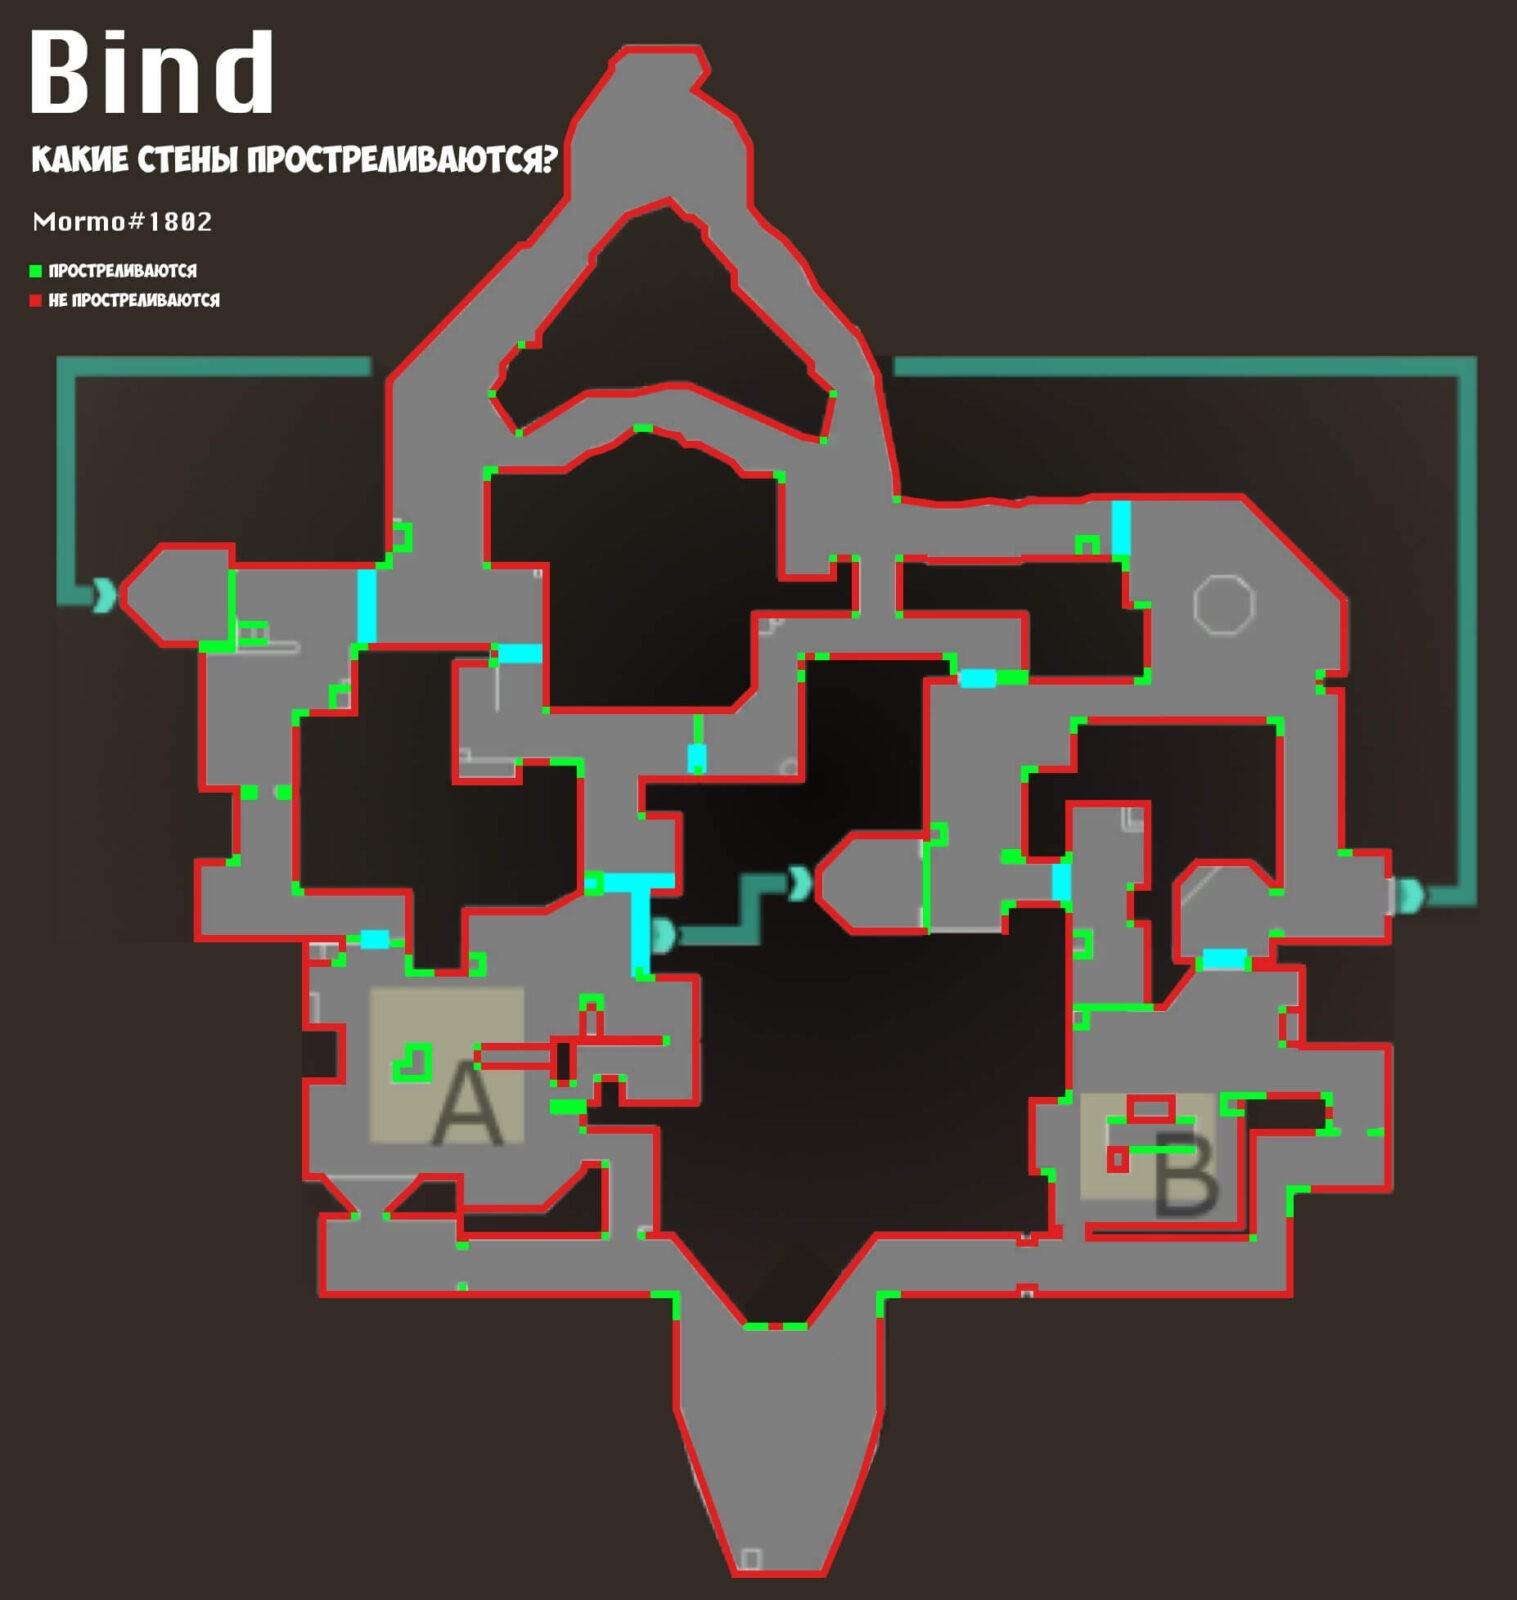 Прострелы Bind